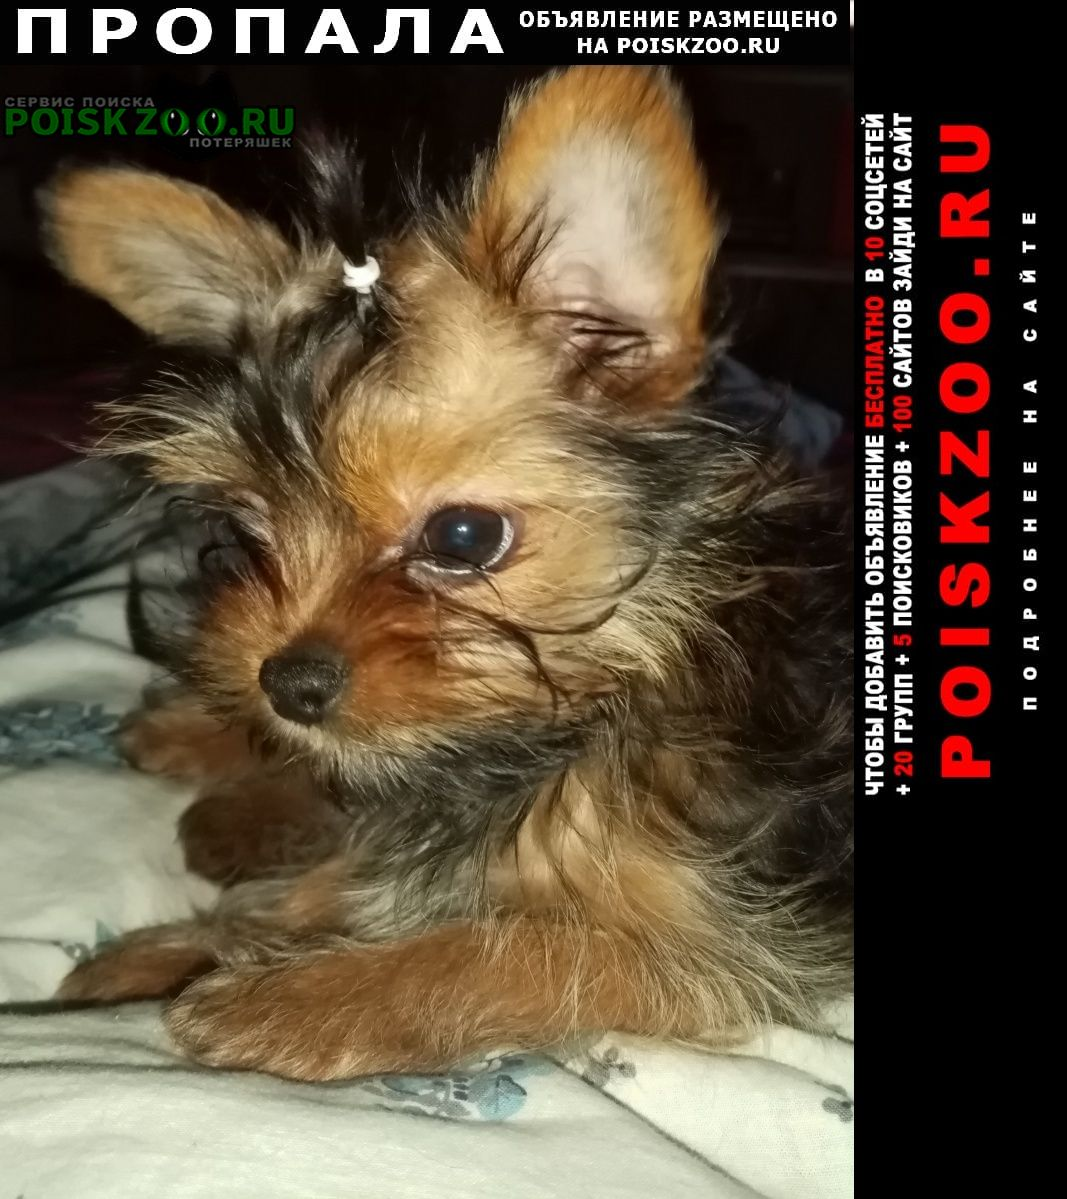 Пропала собака кобель щенок, 7 месяцев Санкт-Петербург